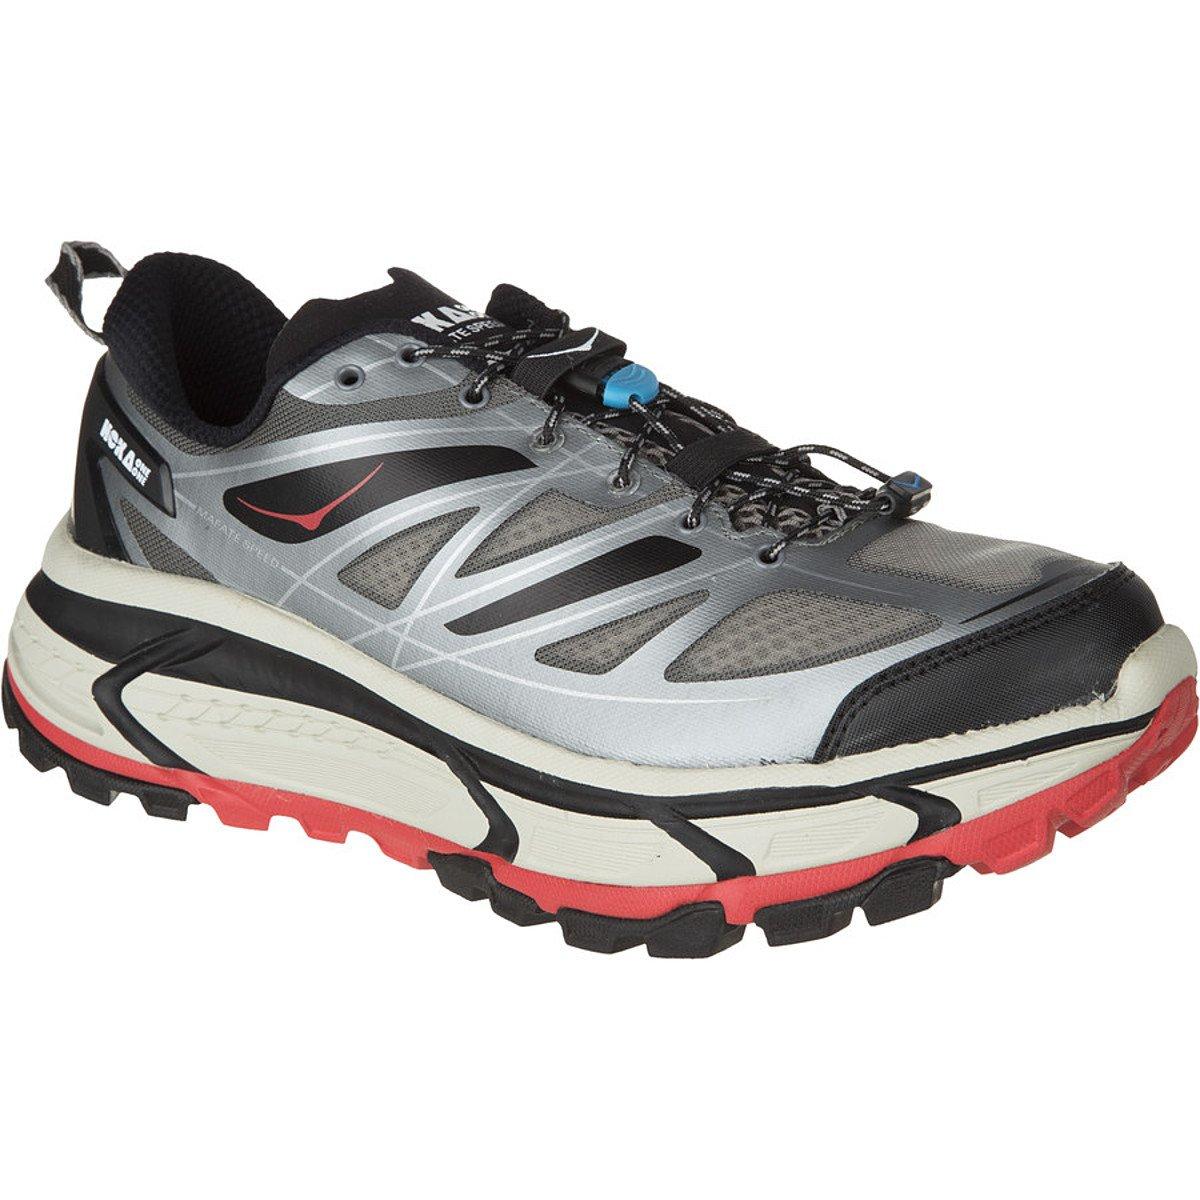 9939d766c788c0 Hoka One One Mafate Speed Trail Running Shoe - Men s Grey Black Red ...